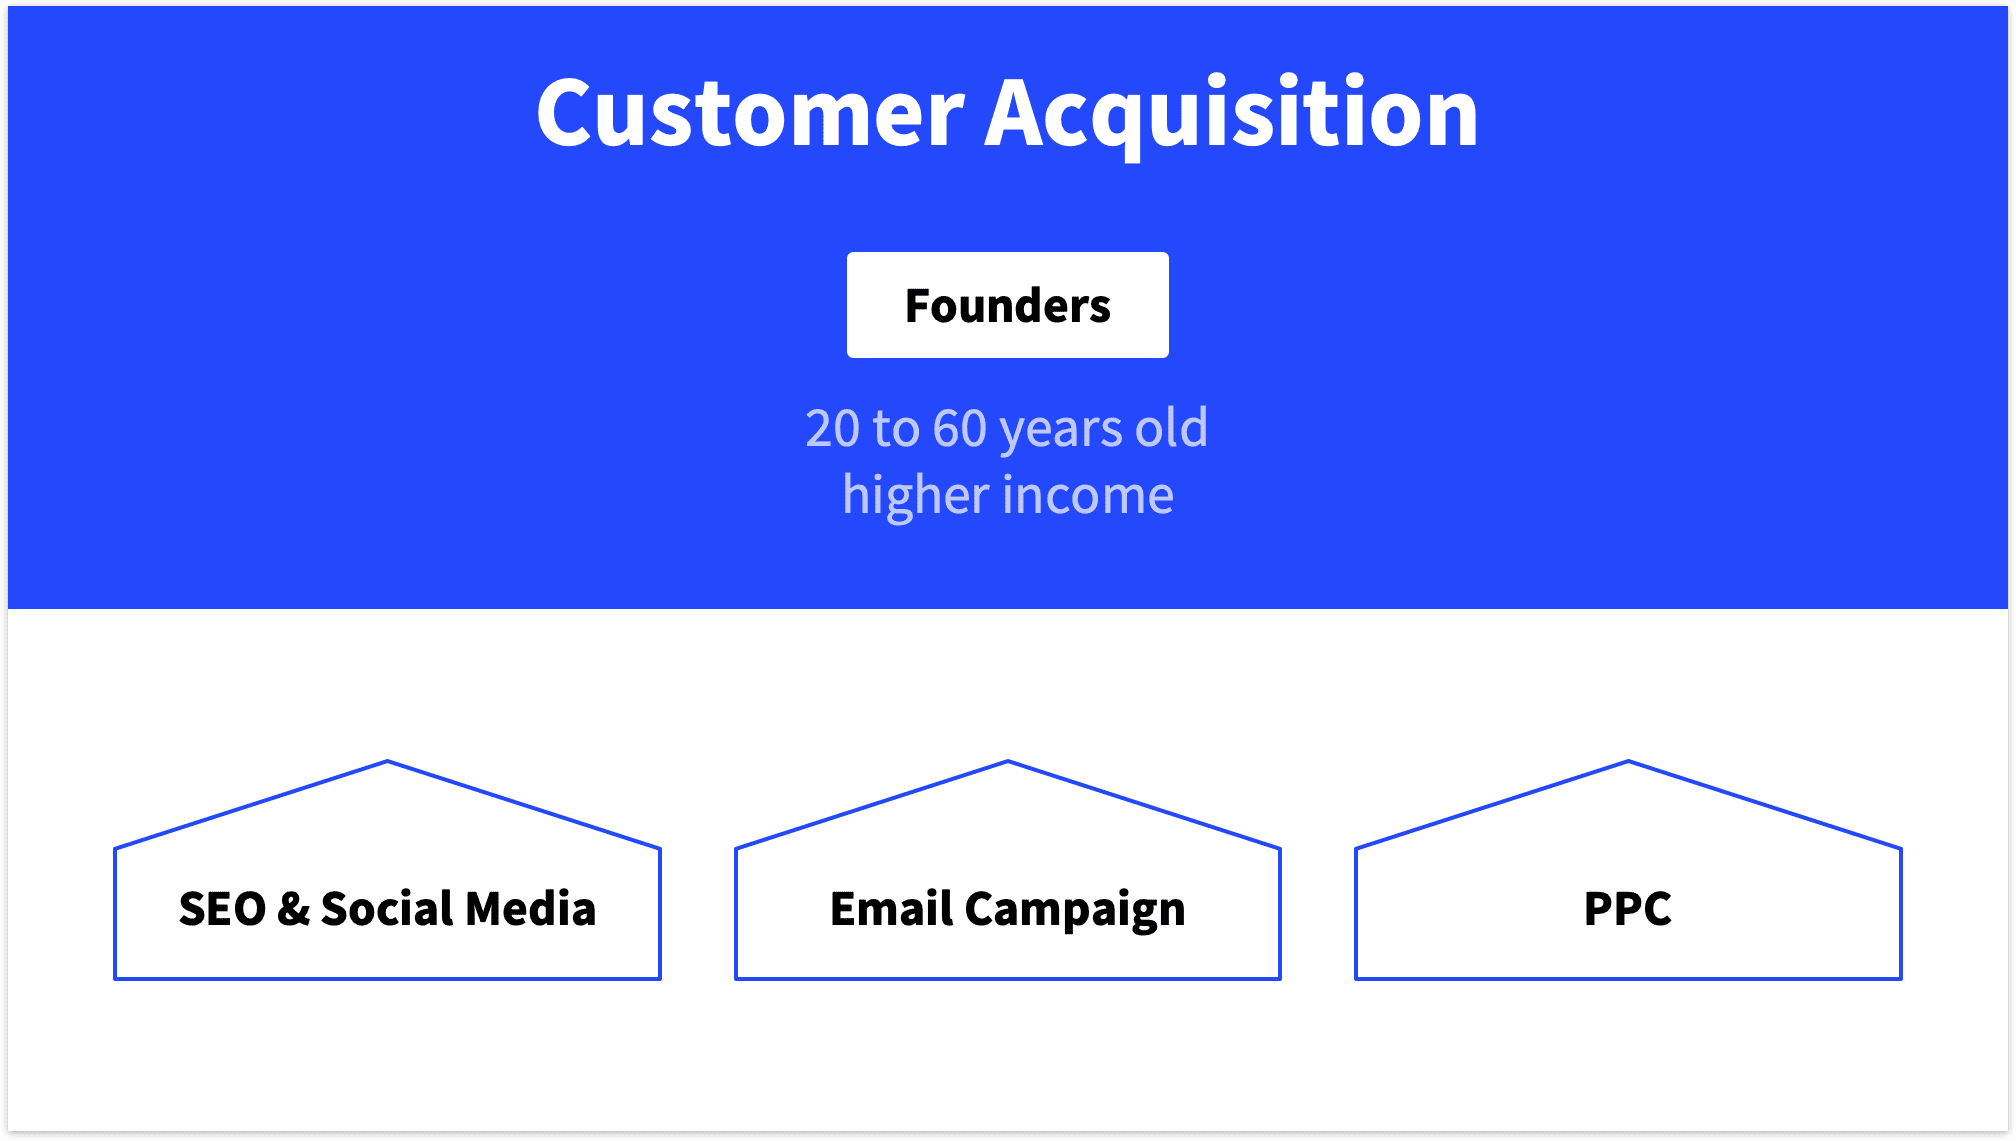 Customer Aquisition Slide 3 Channels